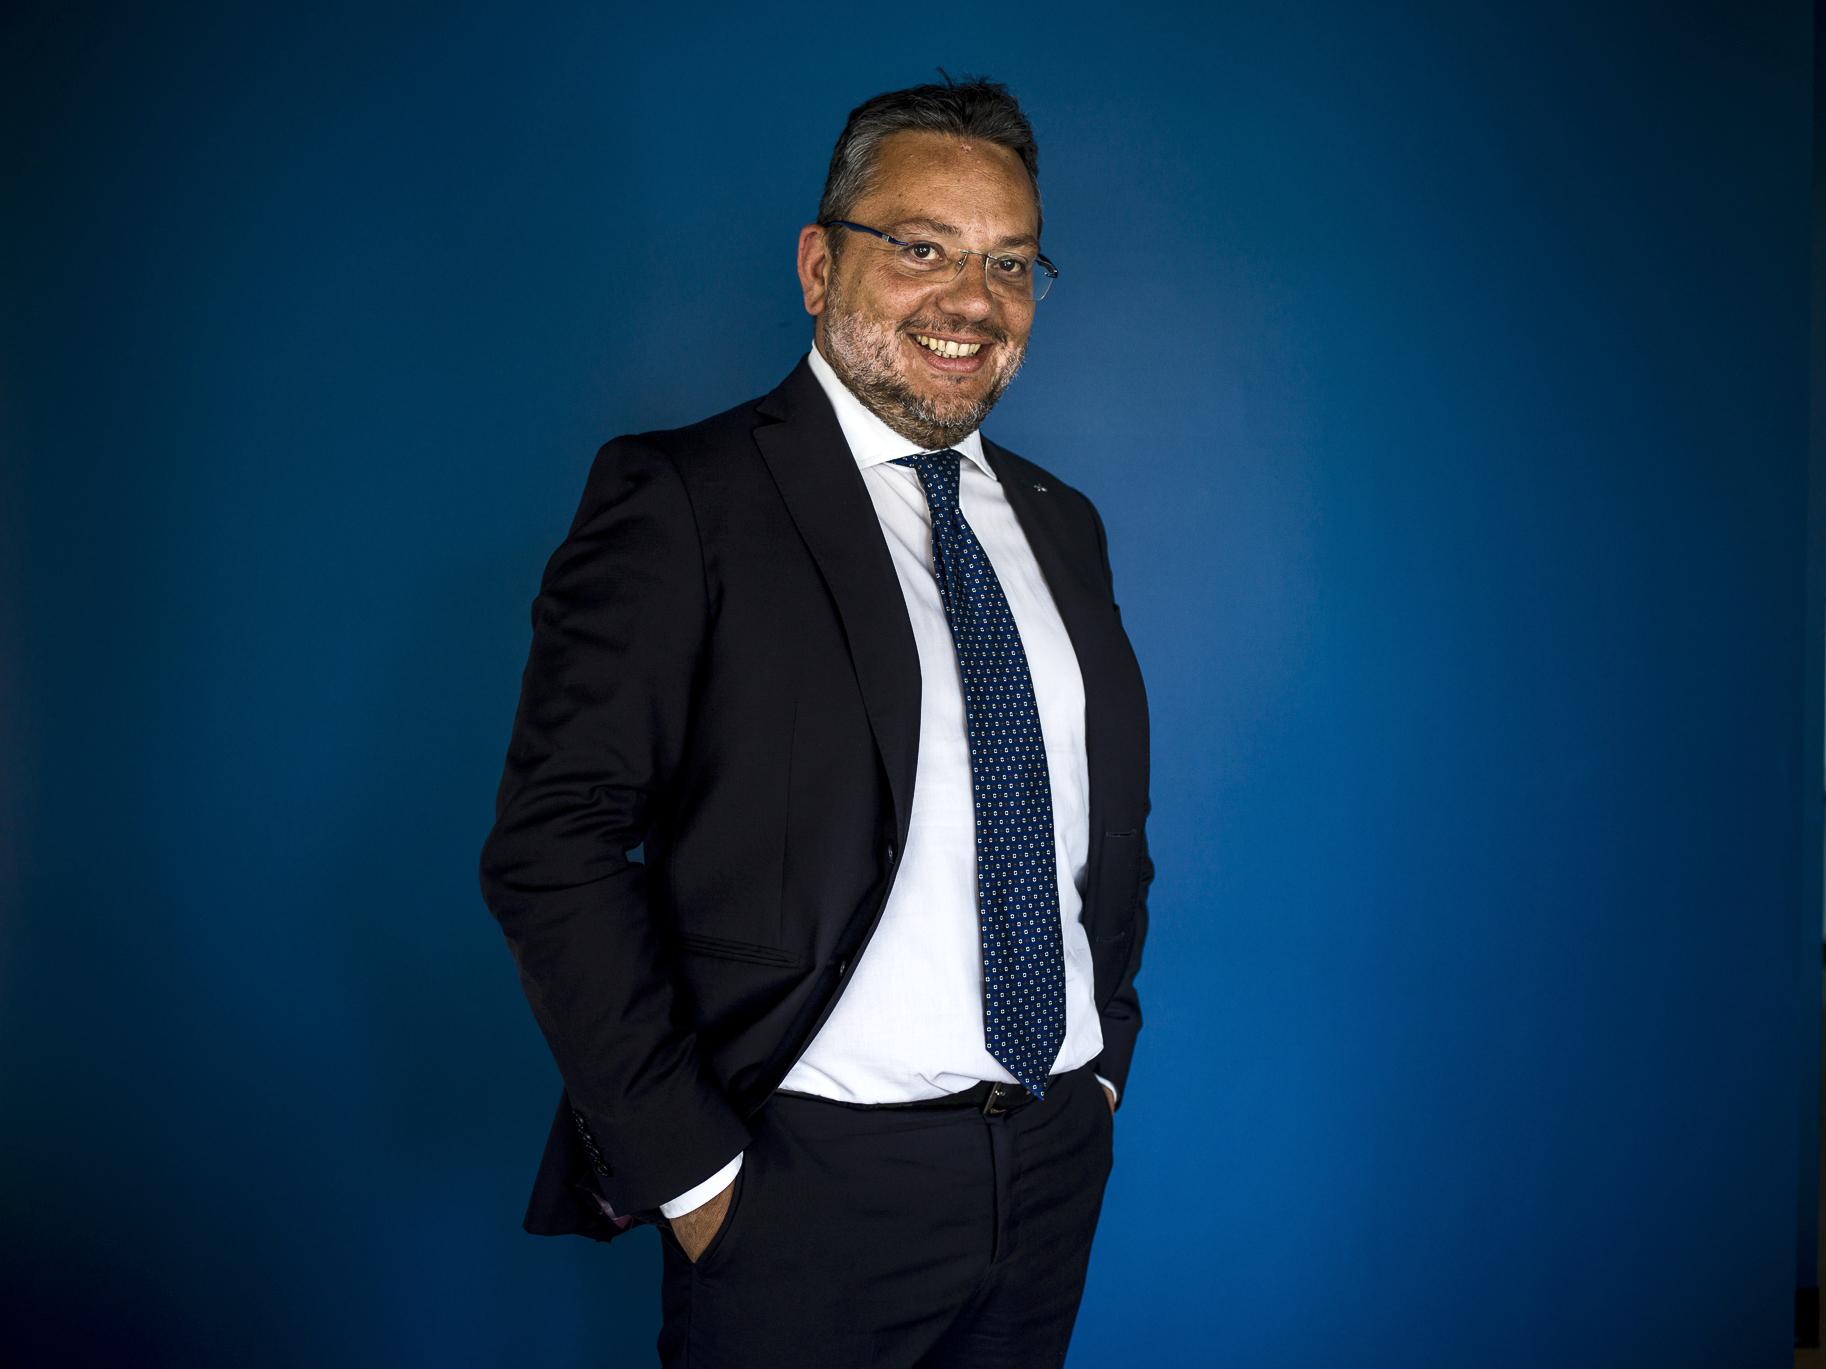 Fernando_Diana_CEO_Citynews-6